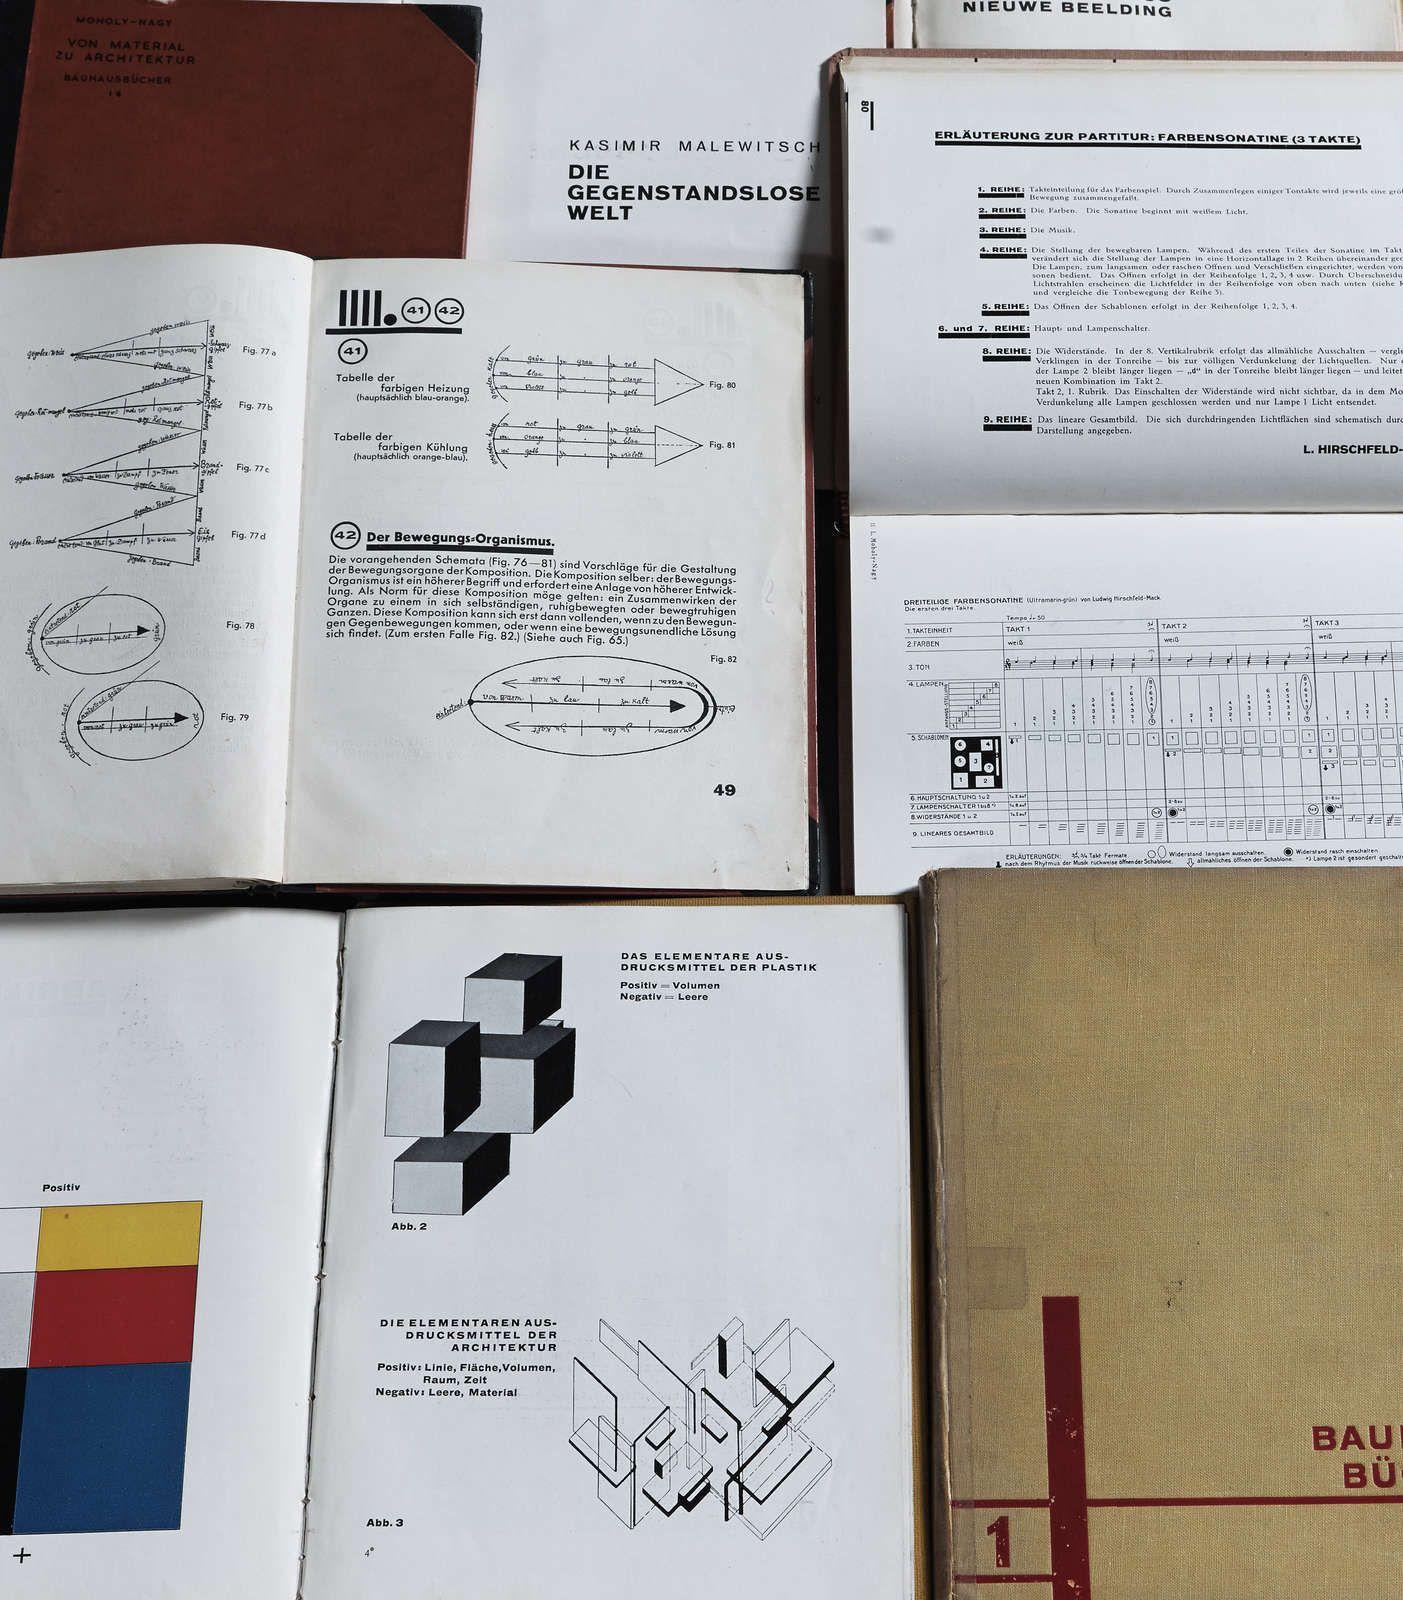 Bauhausbücher, 192530 Kunstbib.dk (con imágenes) Escuela